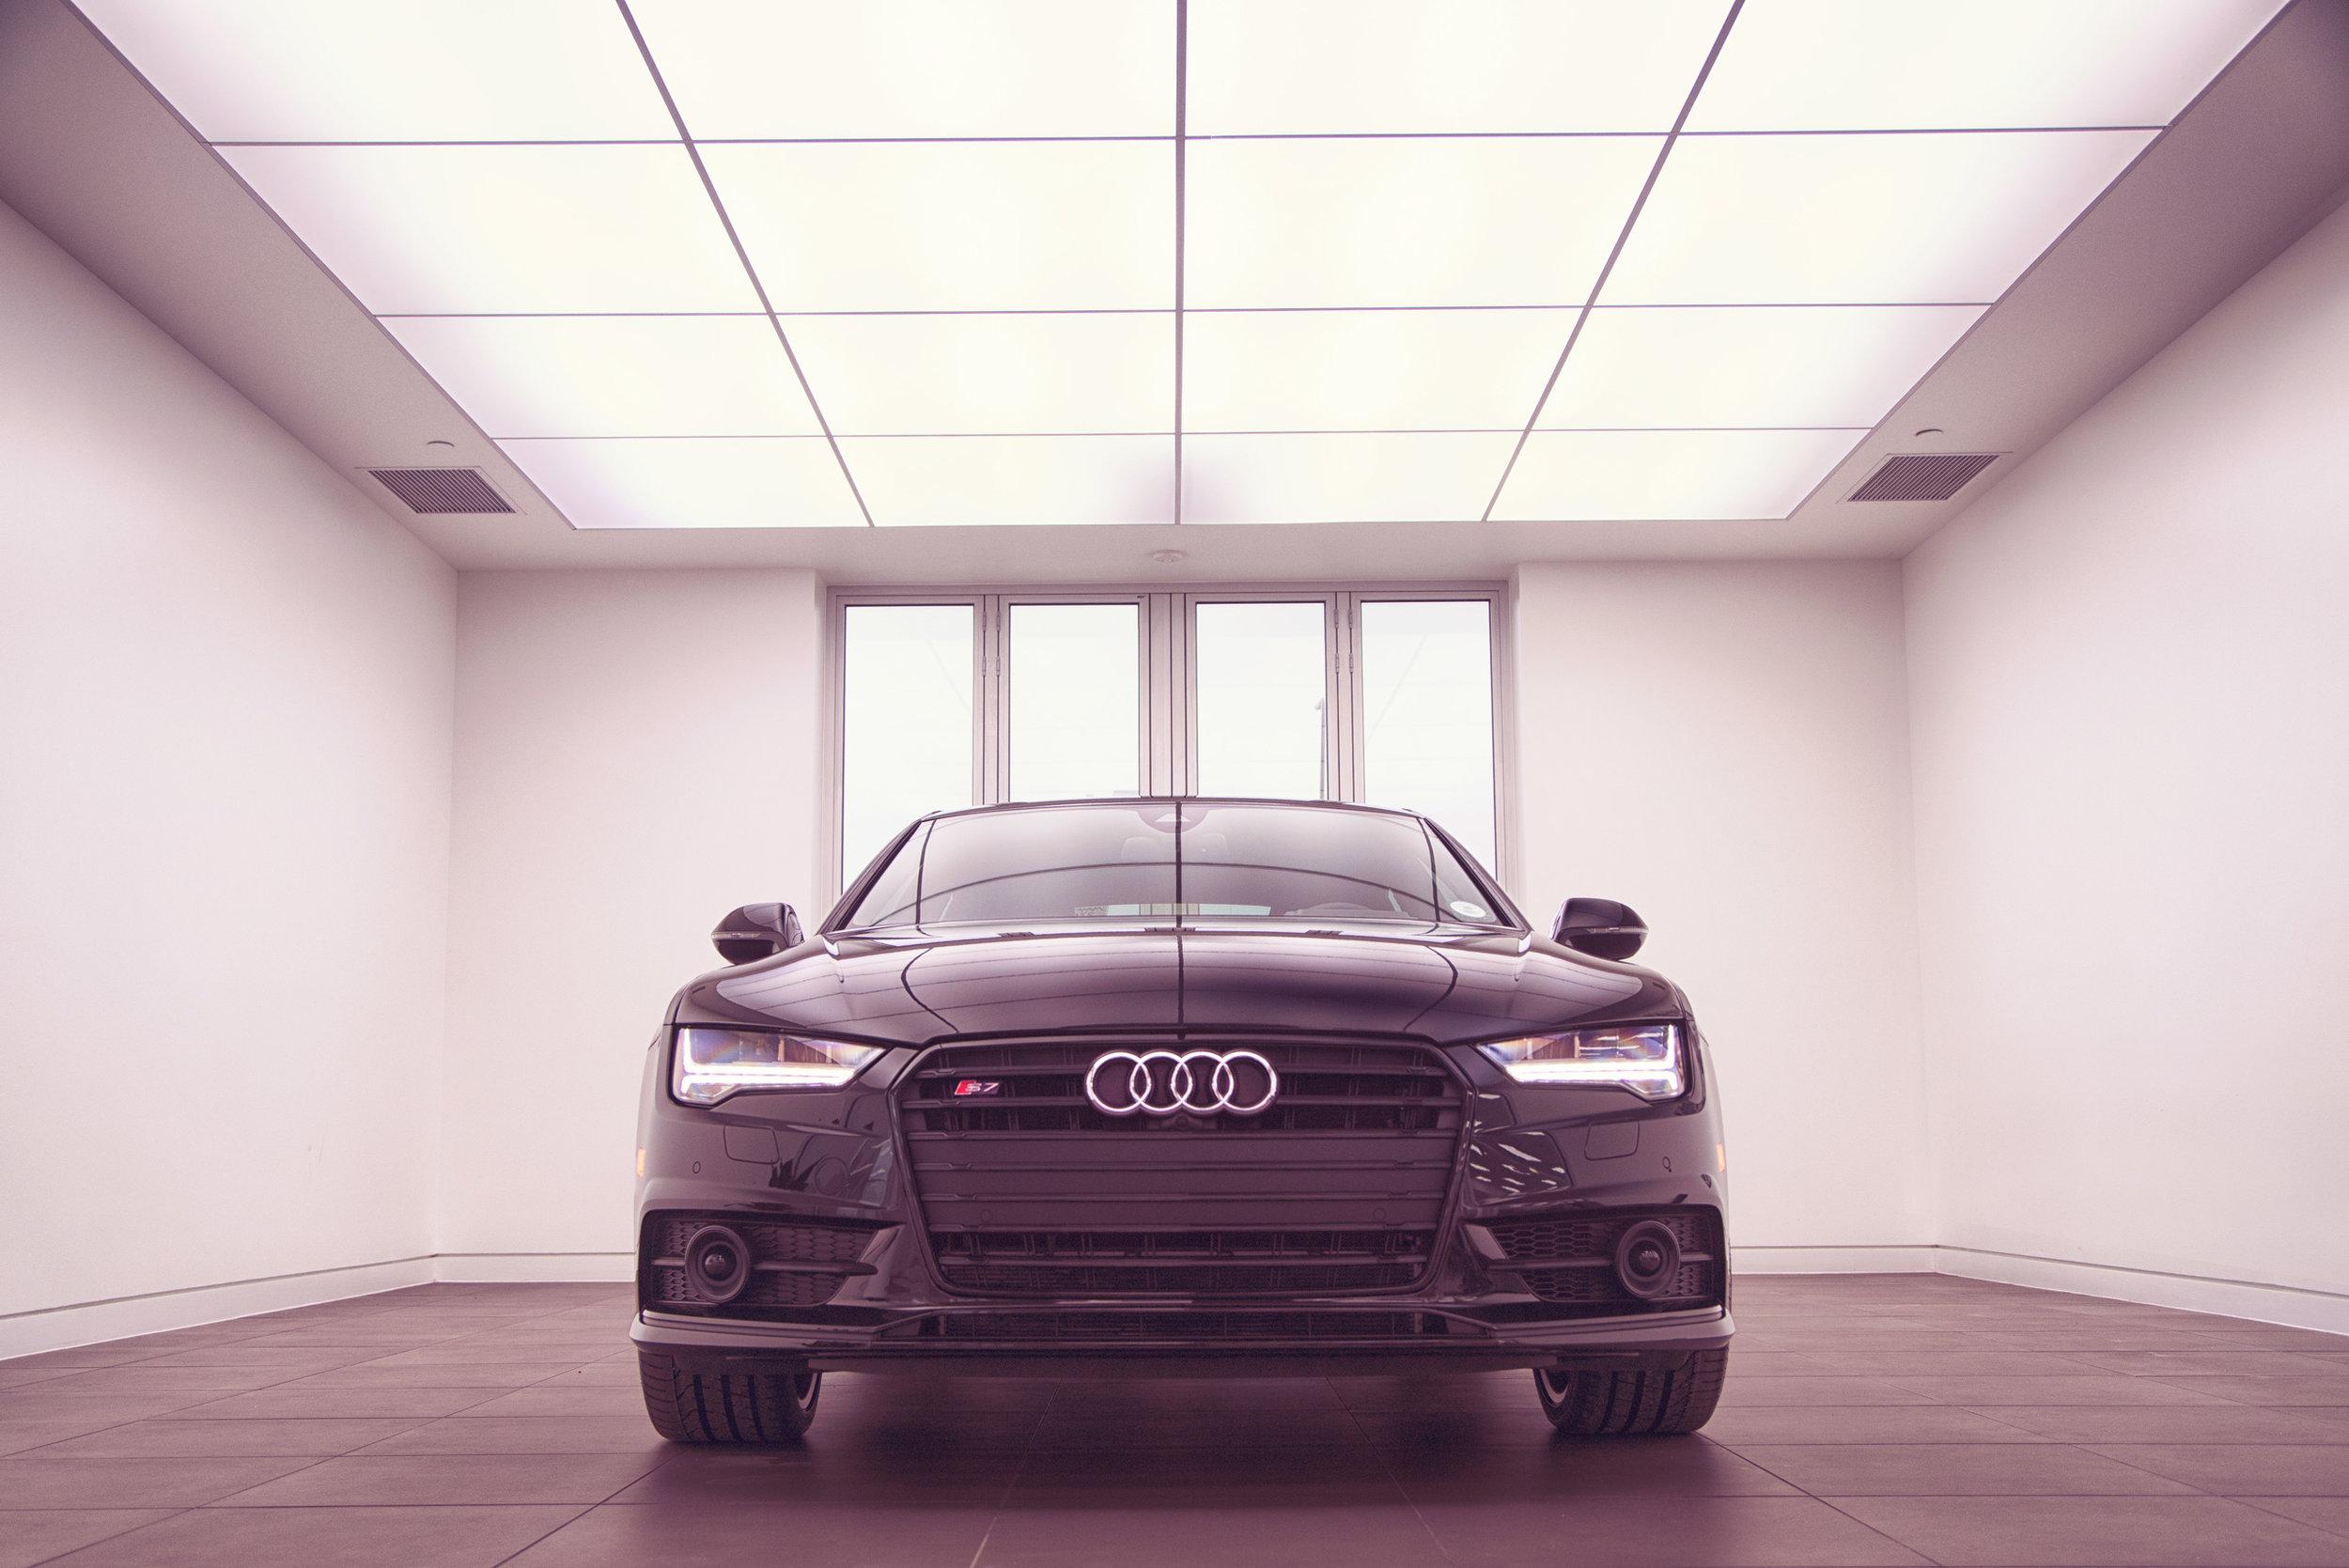 Audi_S7_Front.jpg